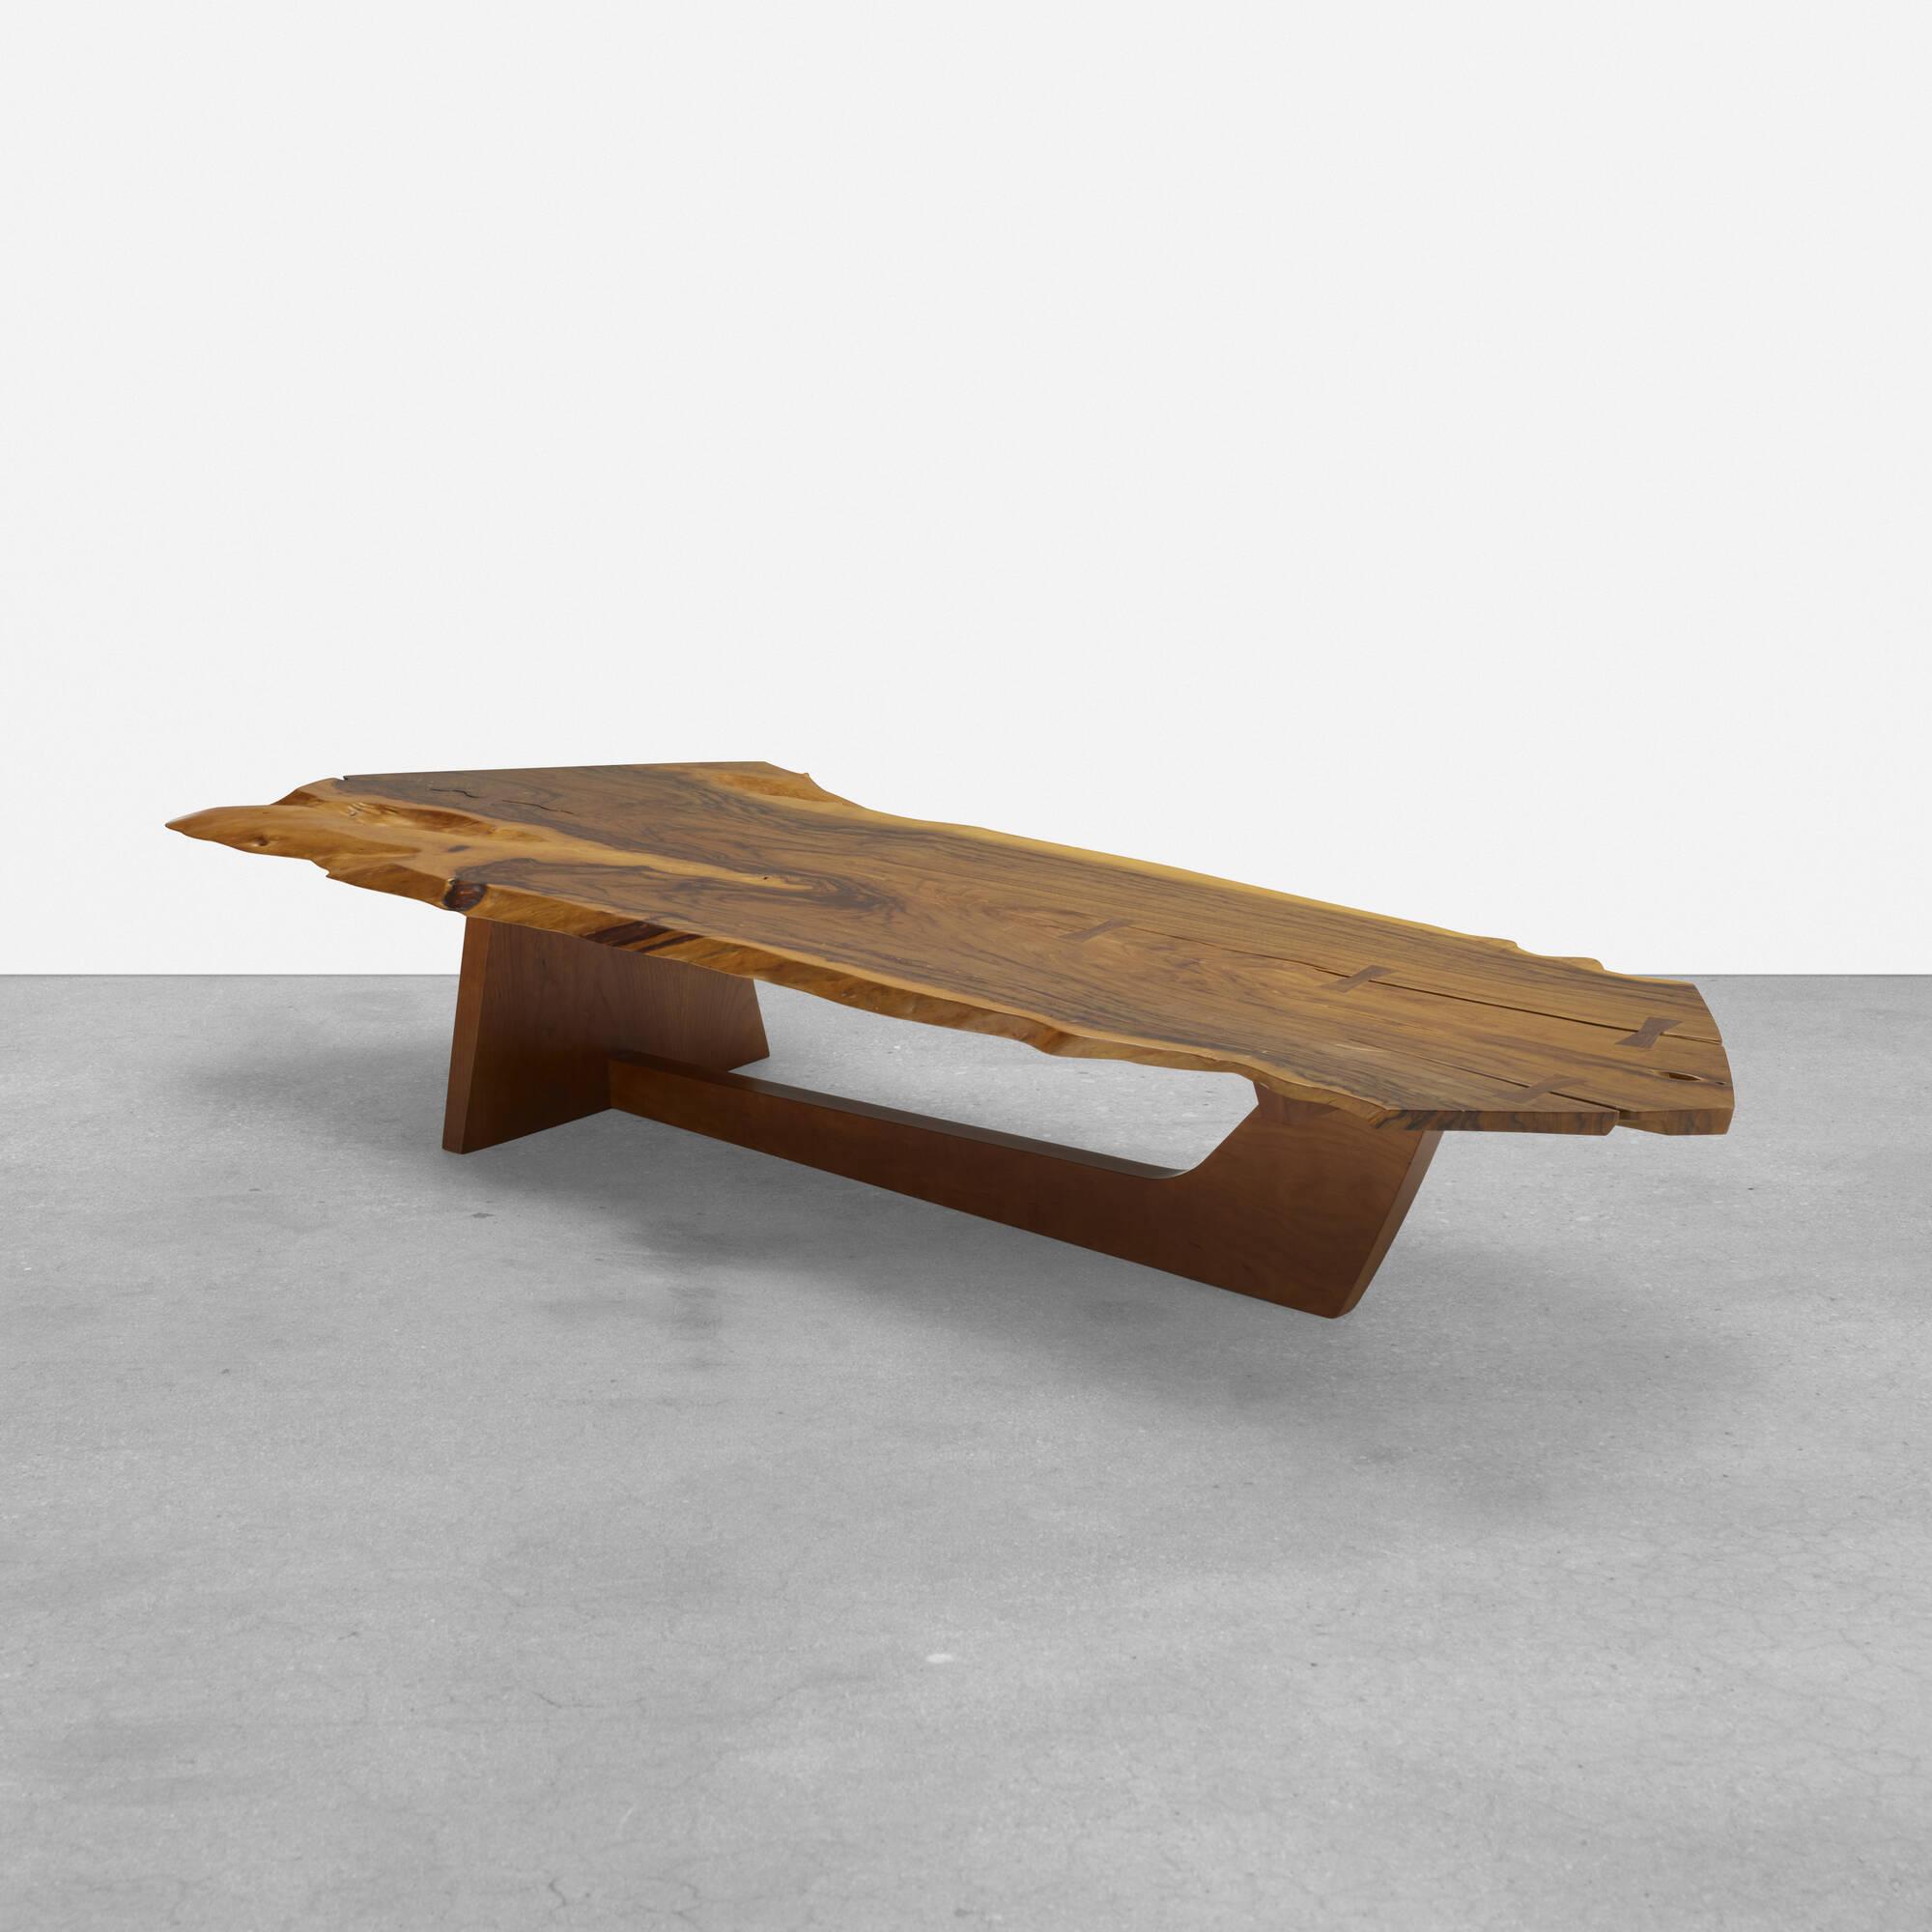 174: Mira Nakashima / coffee table (1 of 5)